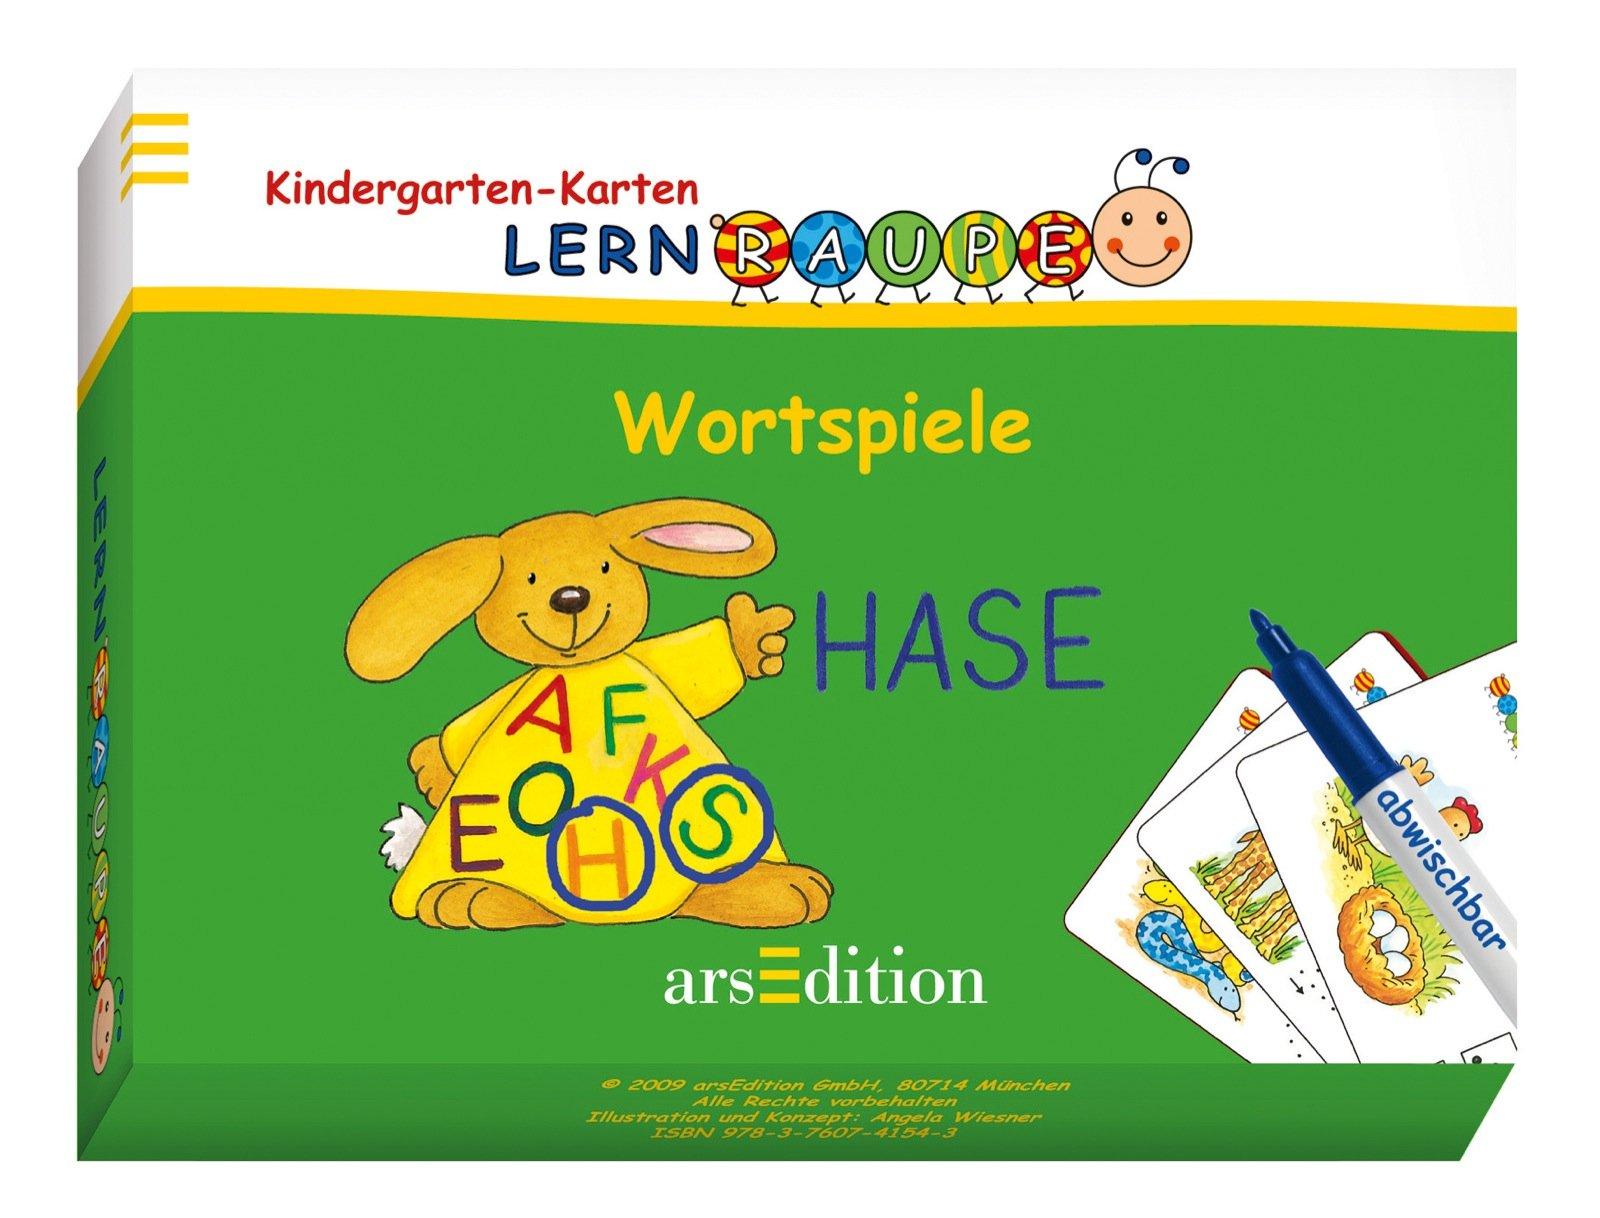 Lernraupe - Wortspiele (Kindergarten-Lernraupe)